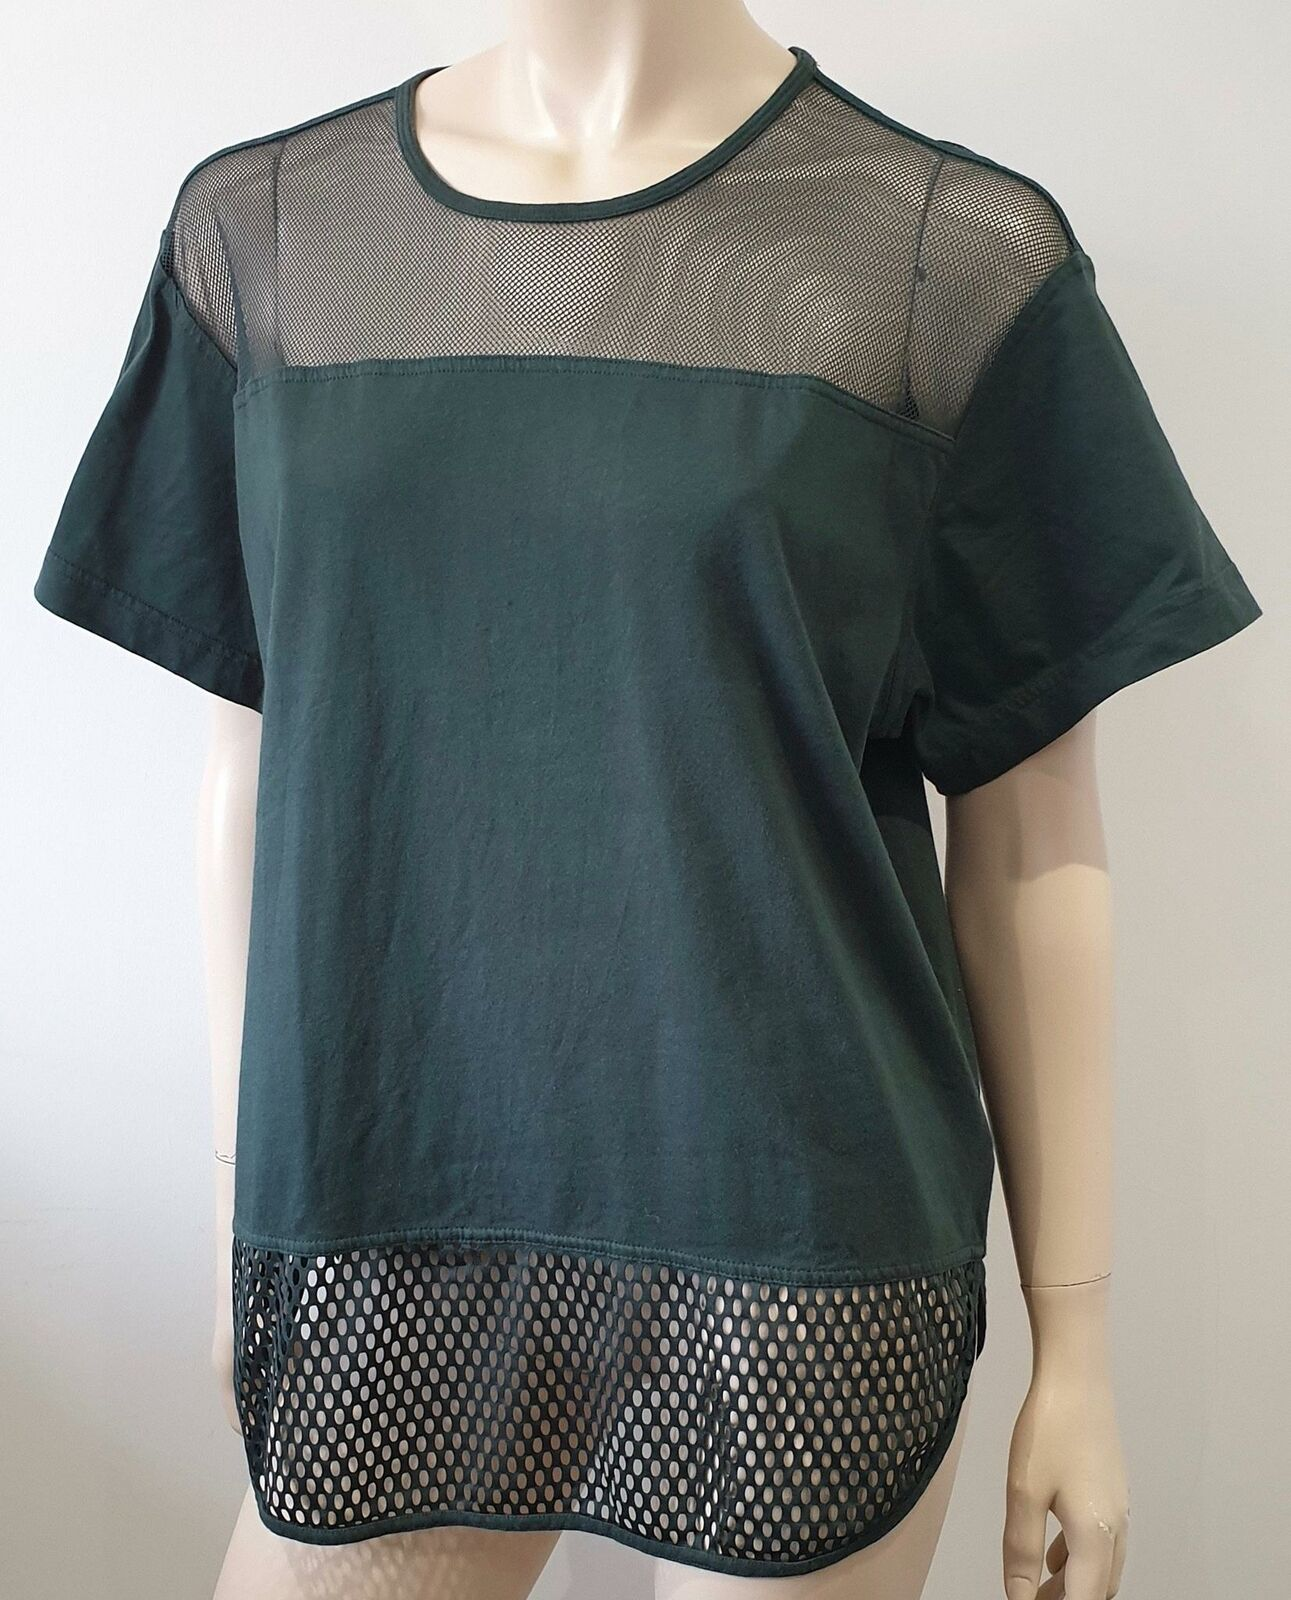 STELLA MCCARTNEY ADIDAS verde Cotton & Maglia Manica Corta T-Shirt Tee Top M